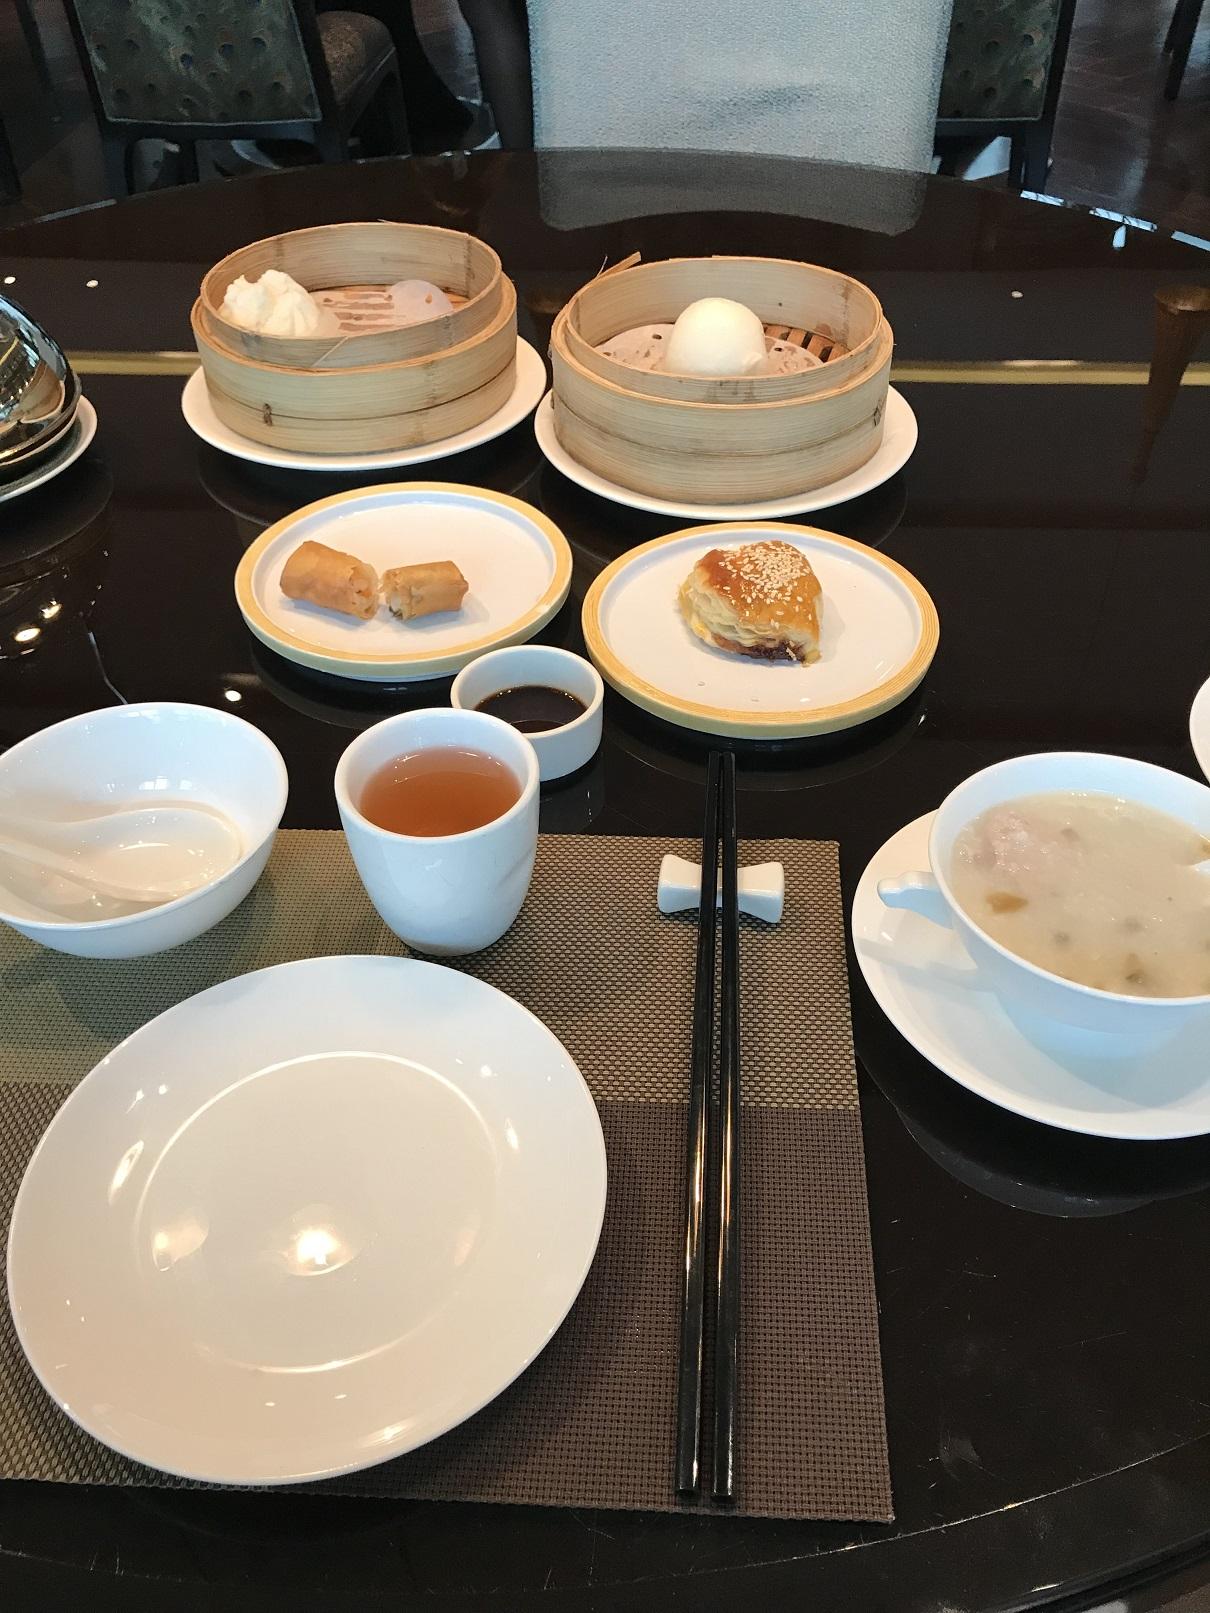 Breakfast at Summer Palace!